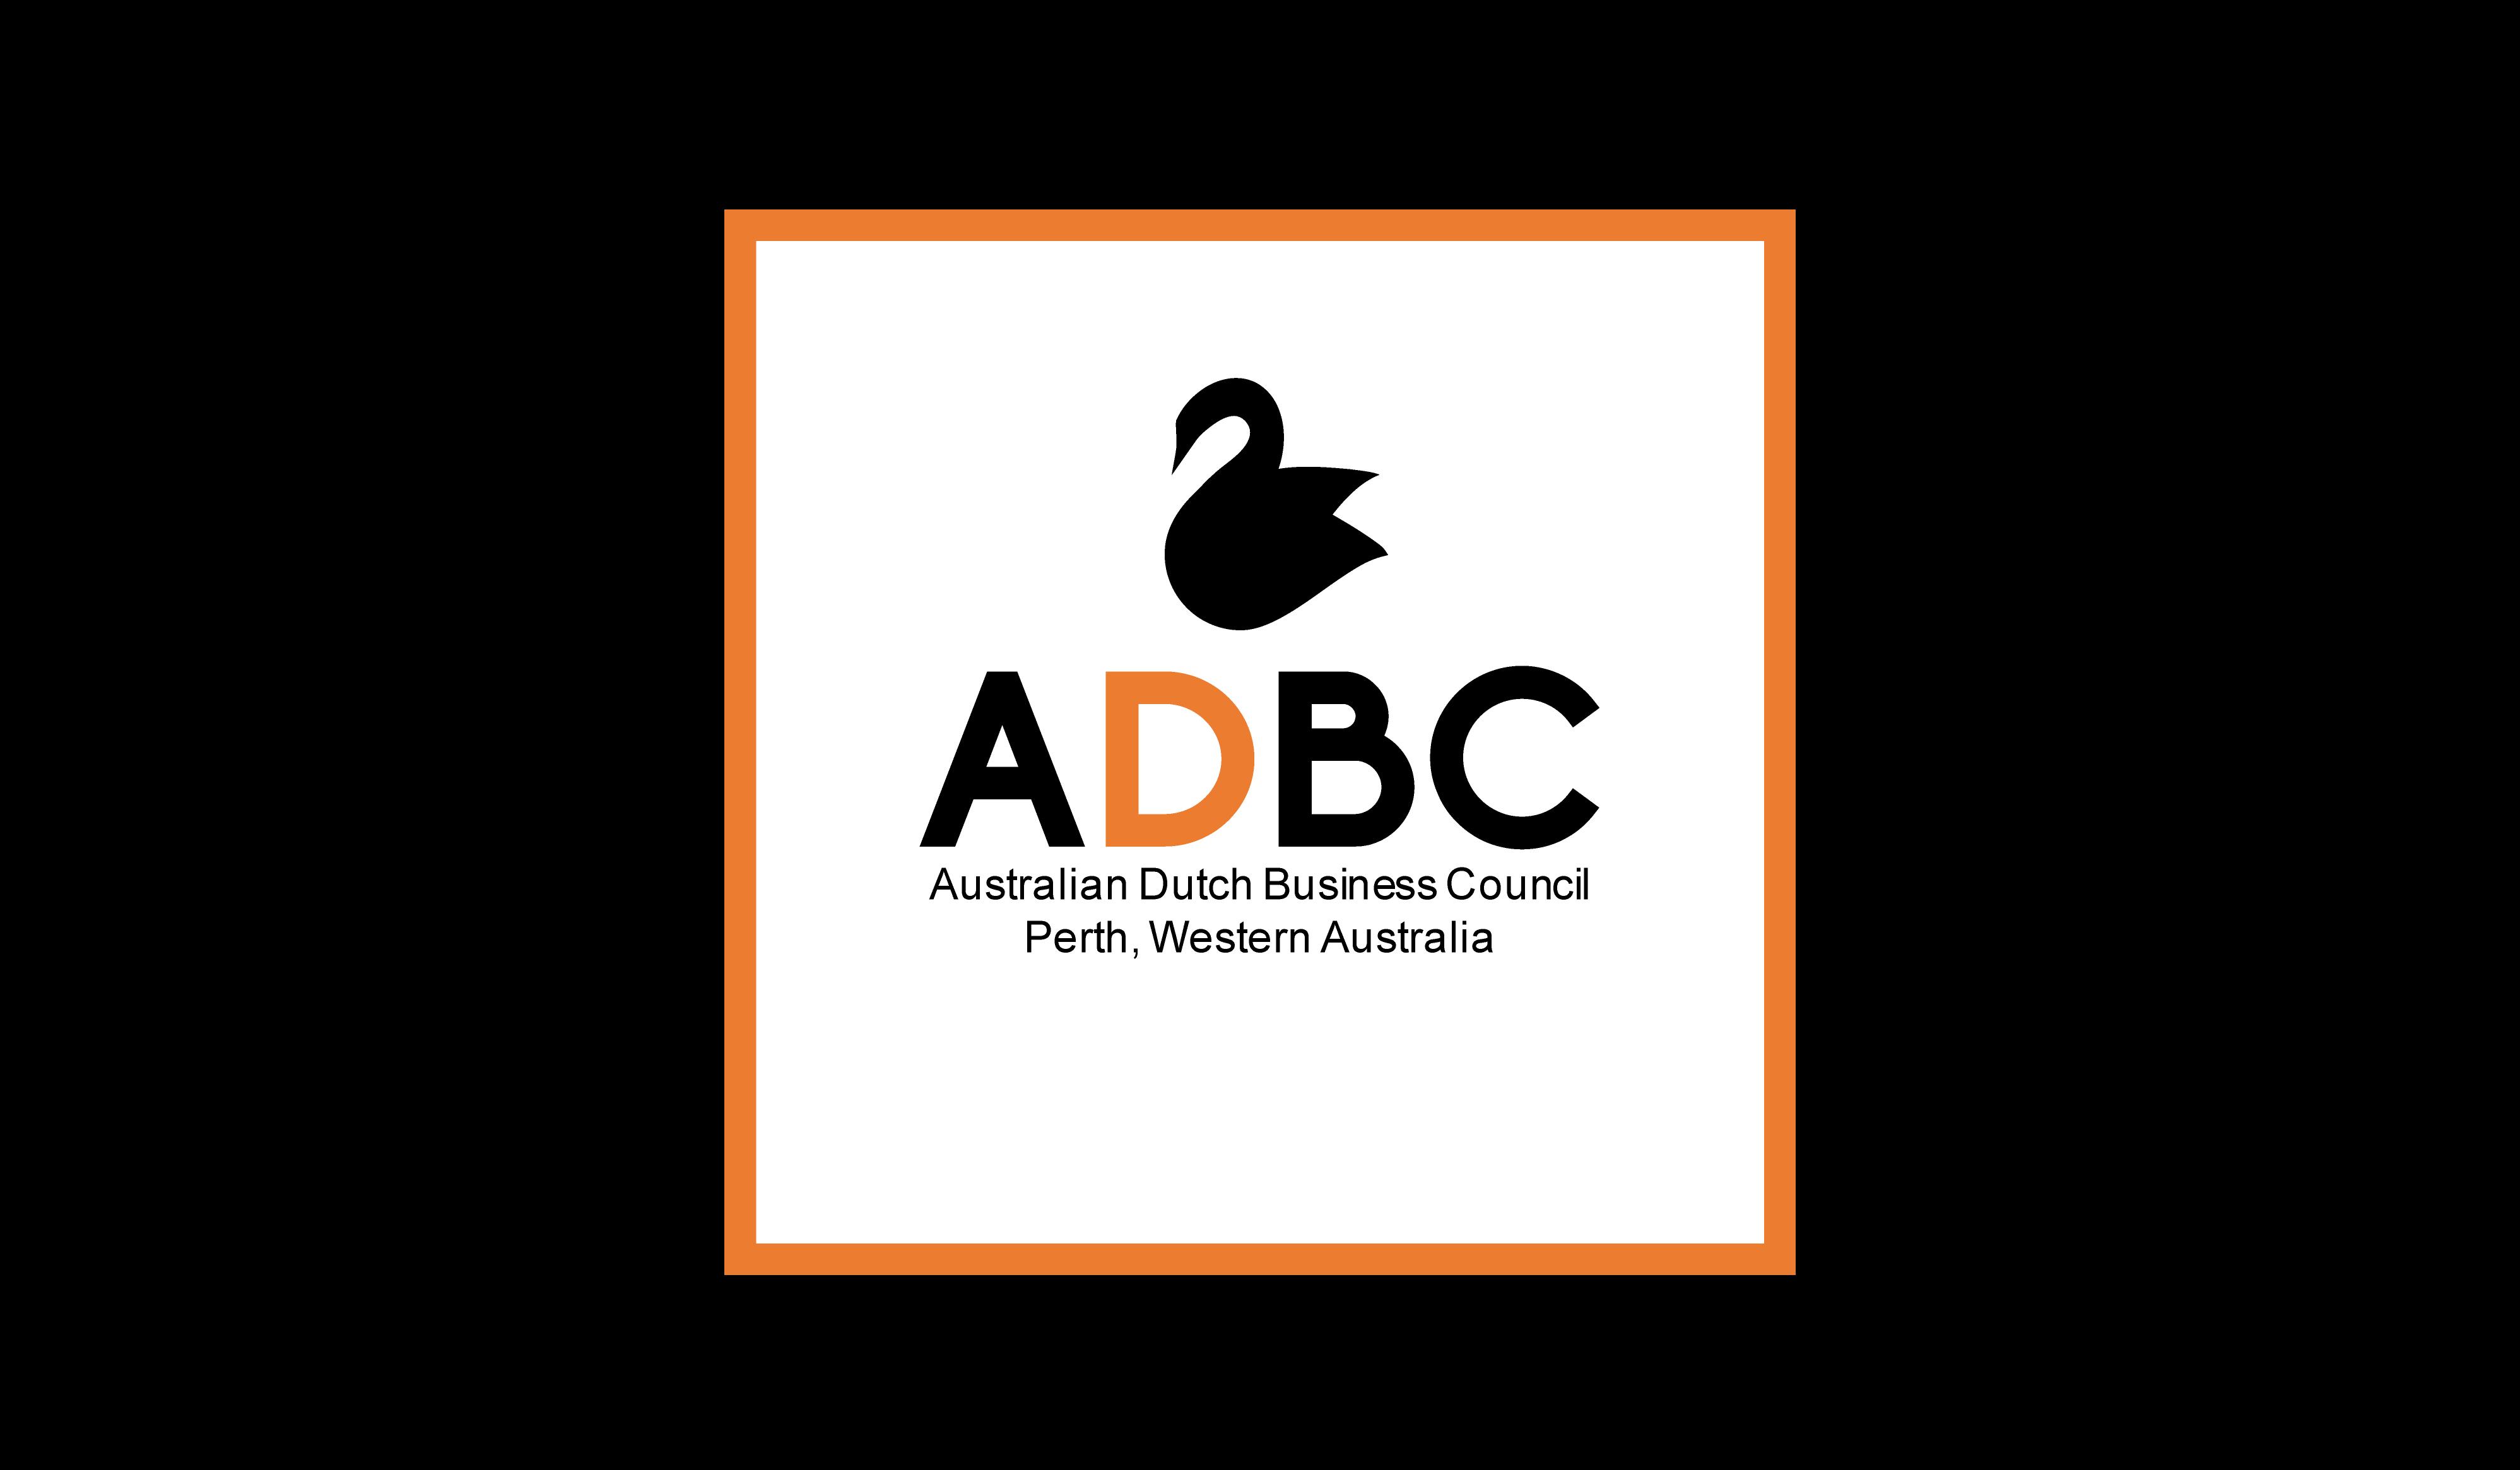 logo ADBC